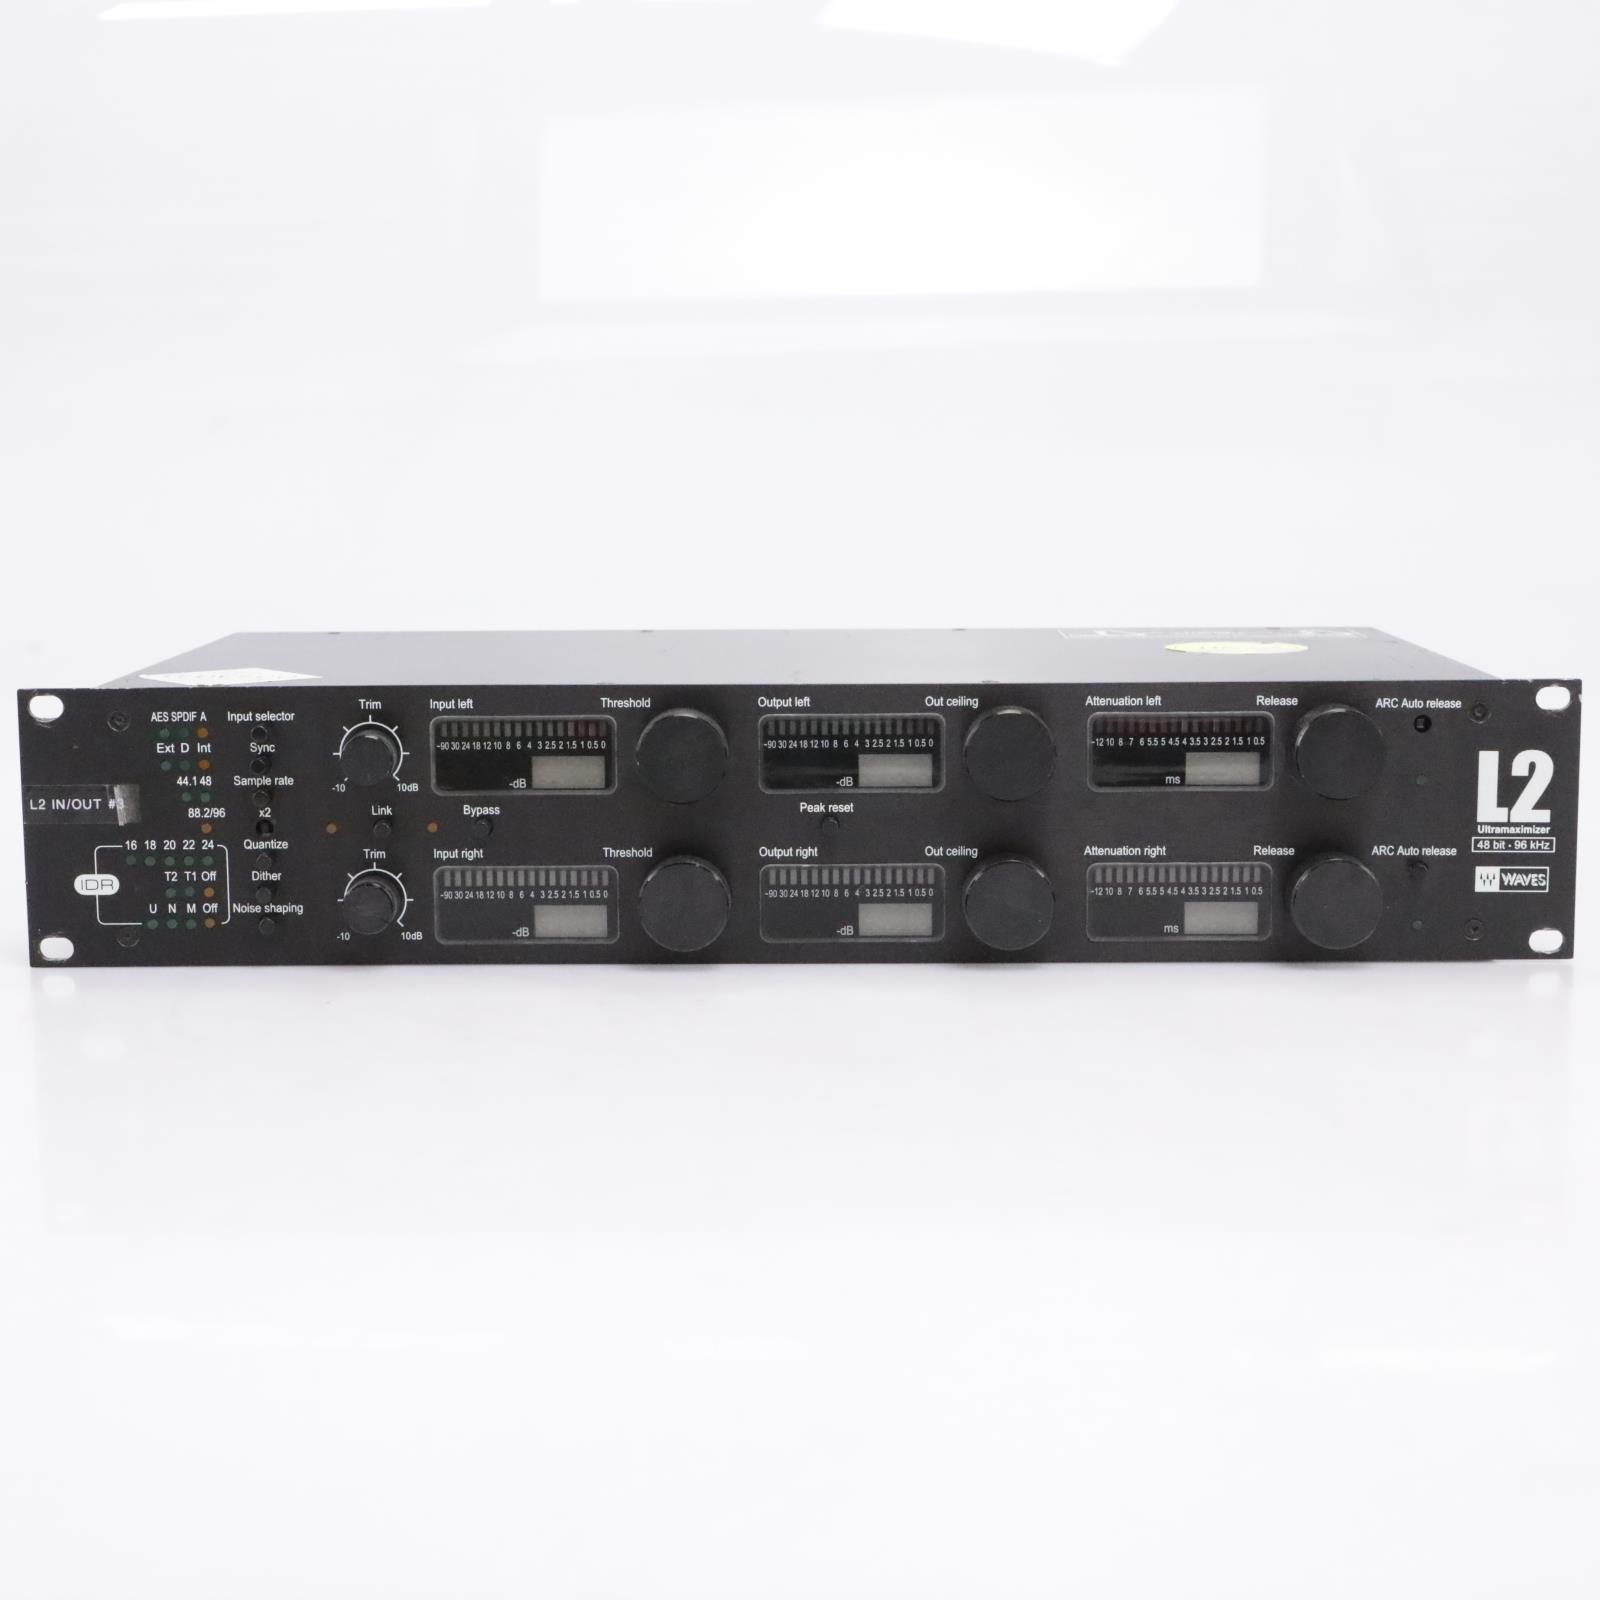 Waves L2 Ultramaximizer Rackmountable Mastering Limiter #43679